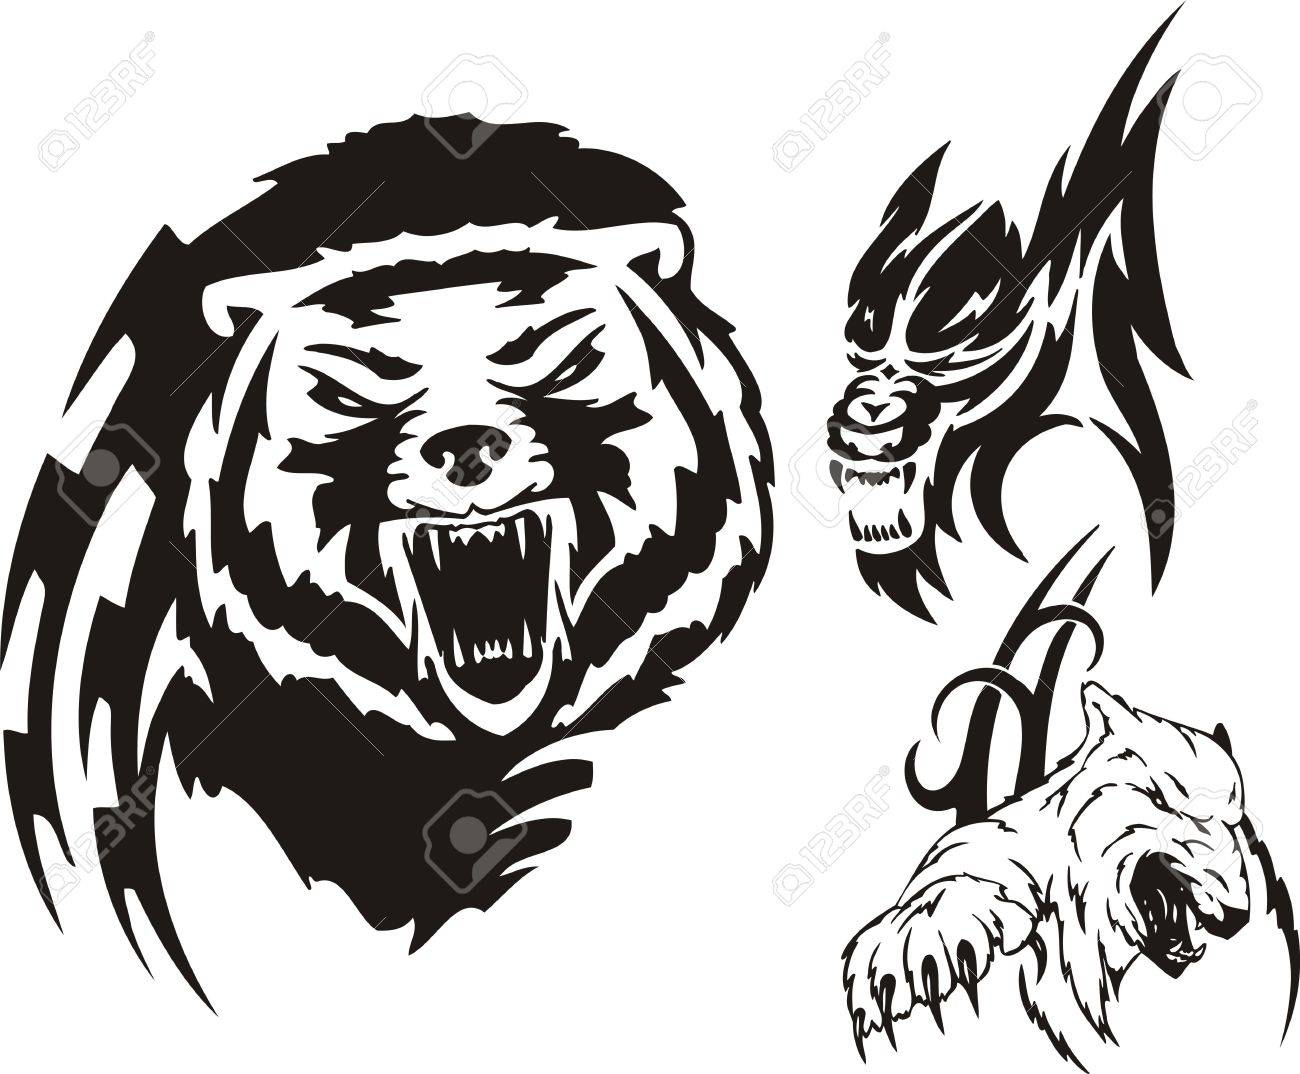 Bear Emblem Cliparts, Stock Vector And Royalty Free Bear Emblem ...